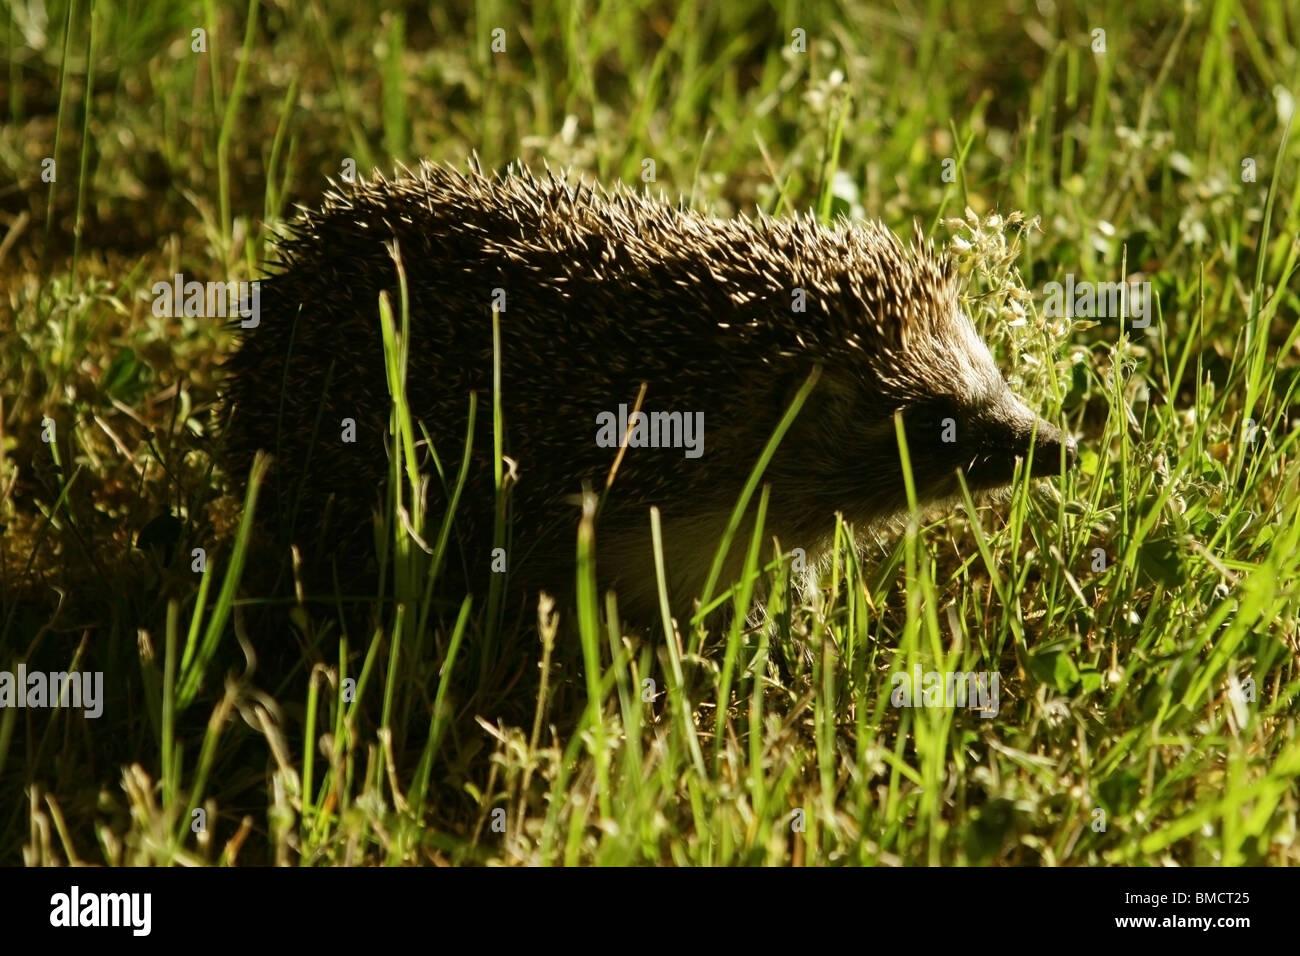 hedgehog on grass - Stock Image